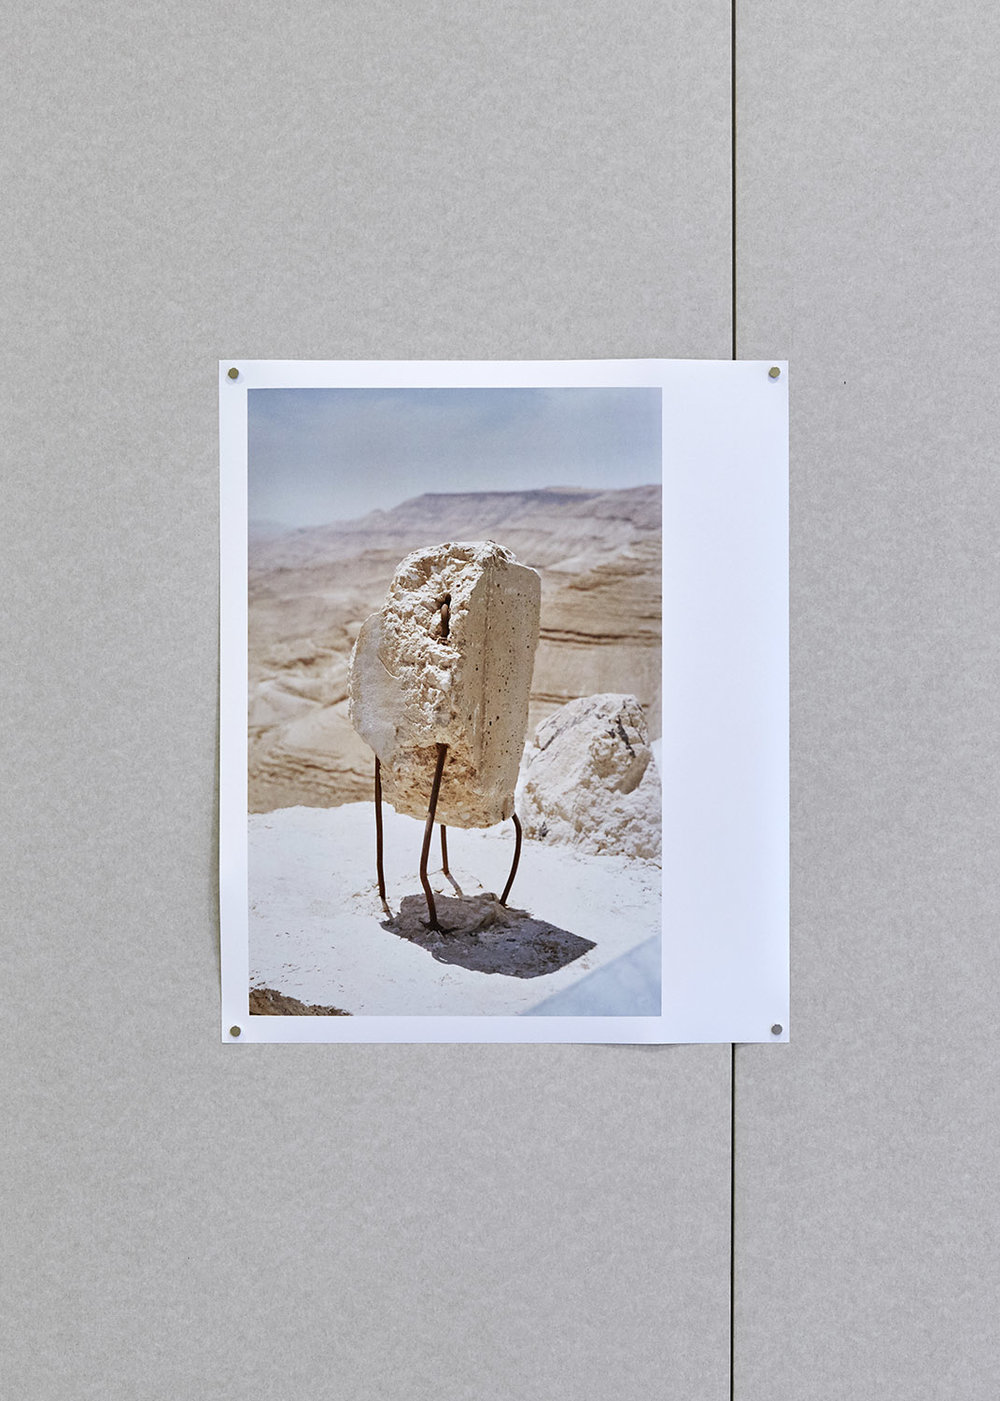 Sophie Chamberlain Untitled (Road side Wadi al-Mujib, Karak) Hand printed photograph on Fuji crystal archive paper 61 x 51 cm, Edition of 6, 2018